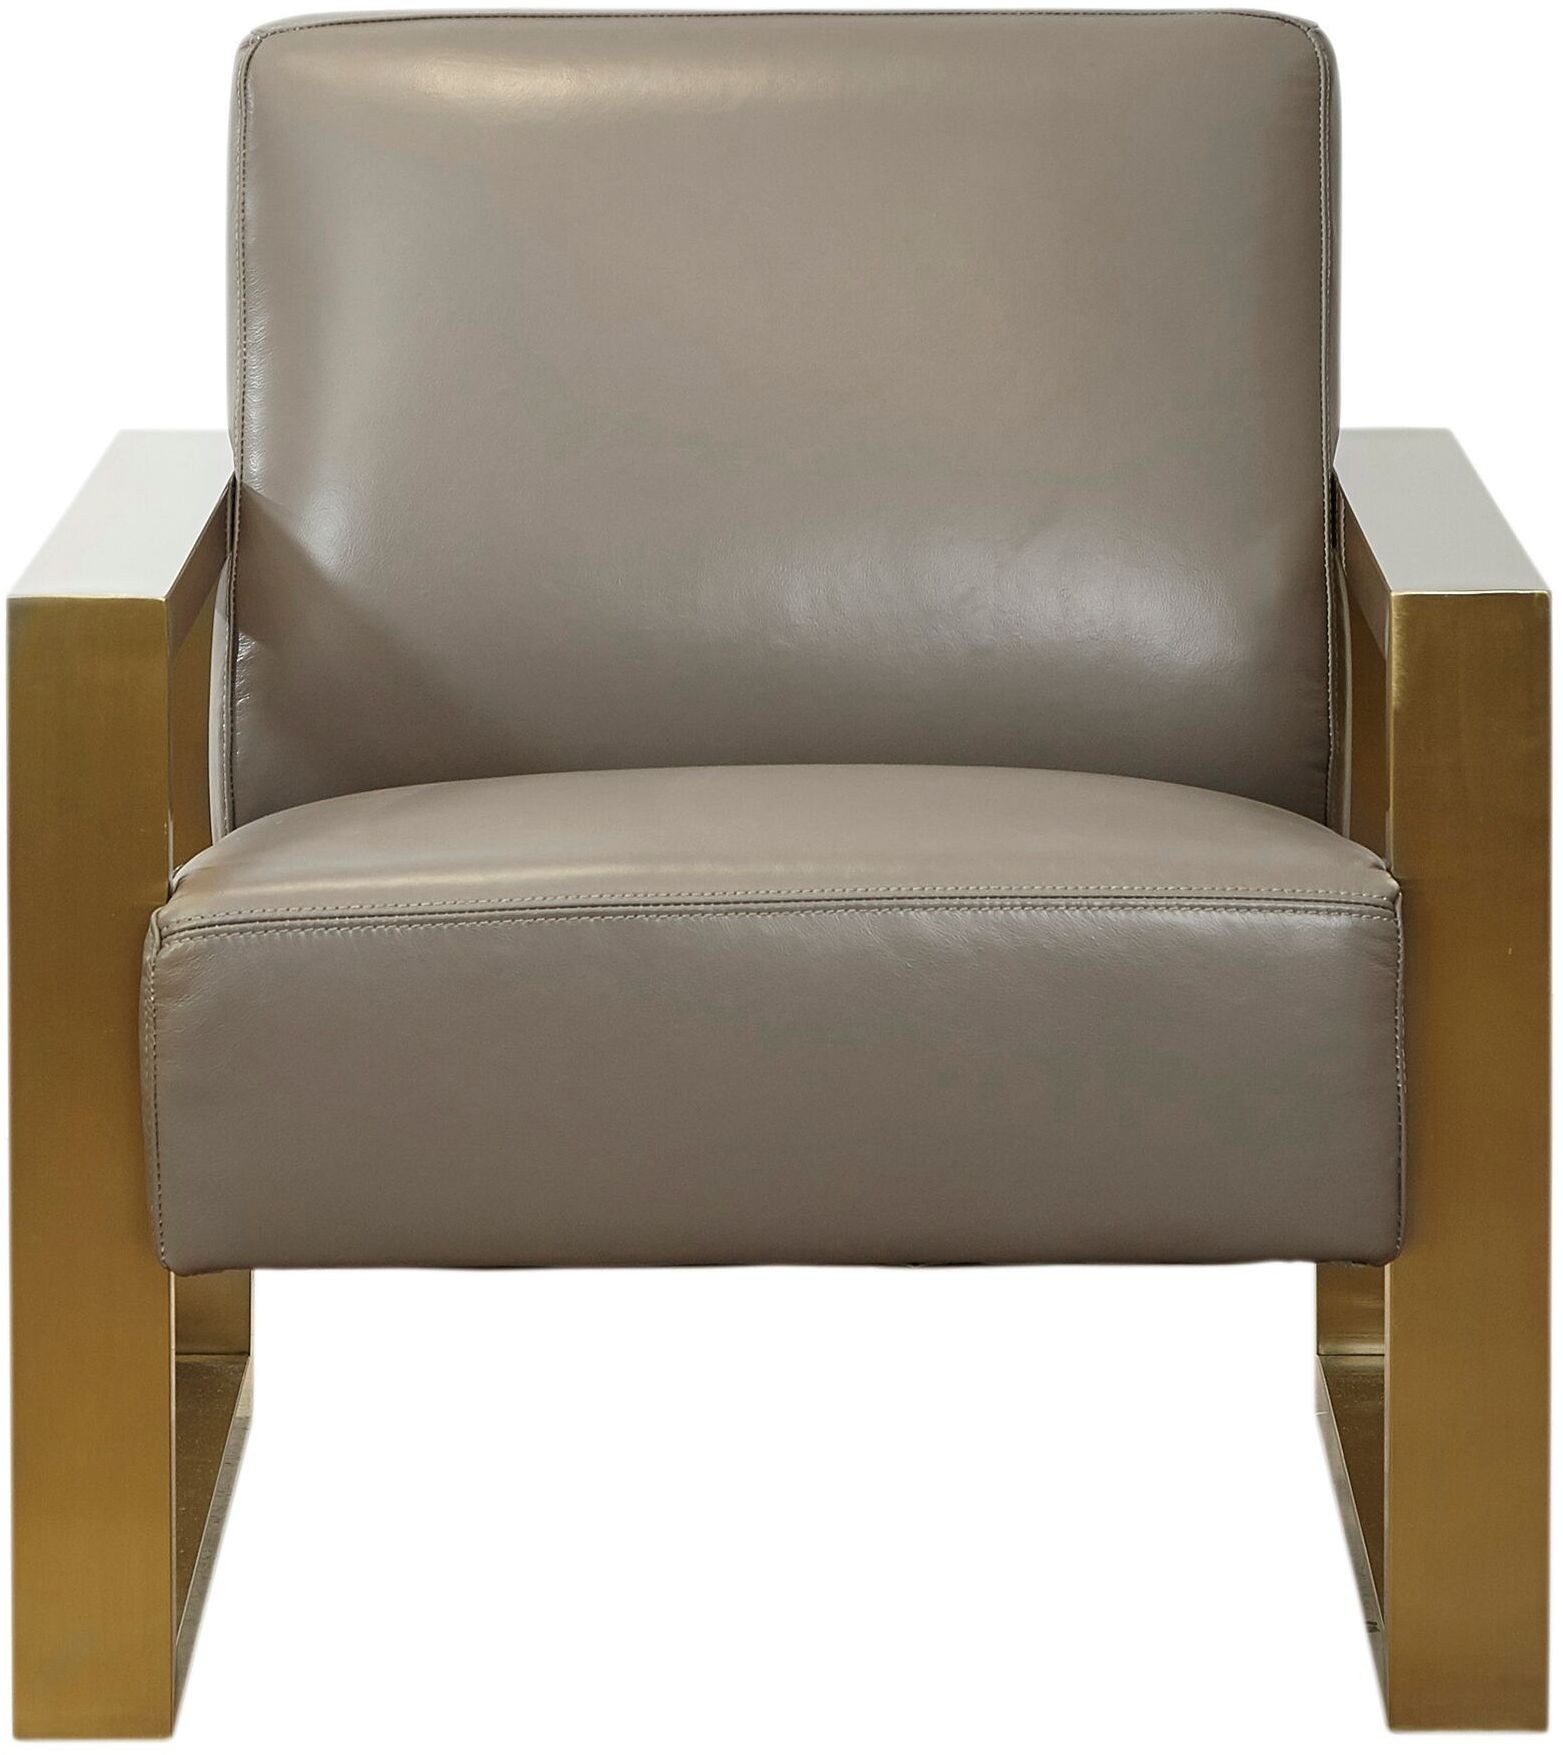 Lexus Metro Grey Top Grain Leather Chair from Lazzaro